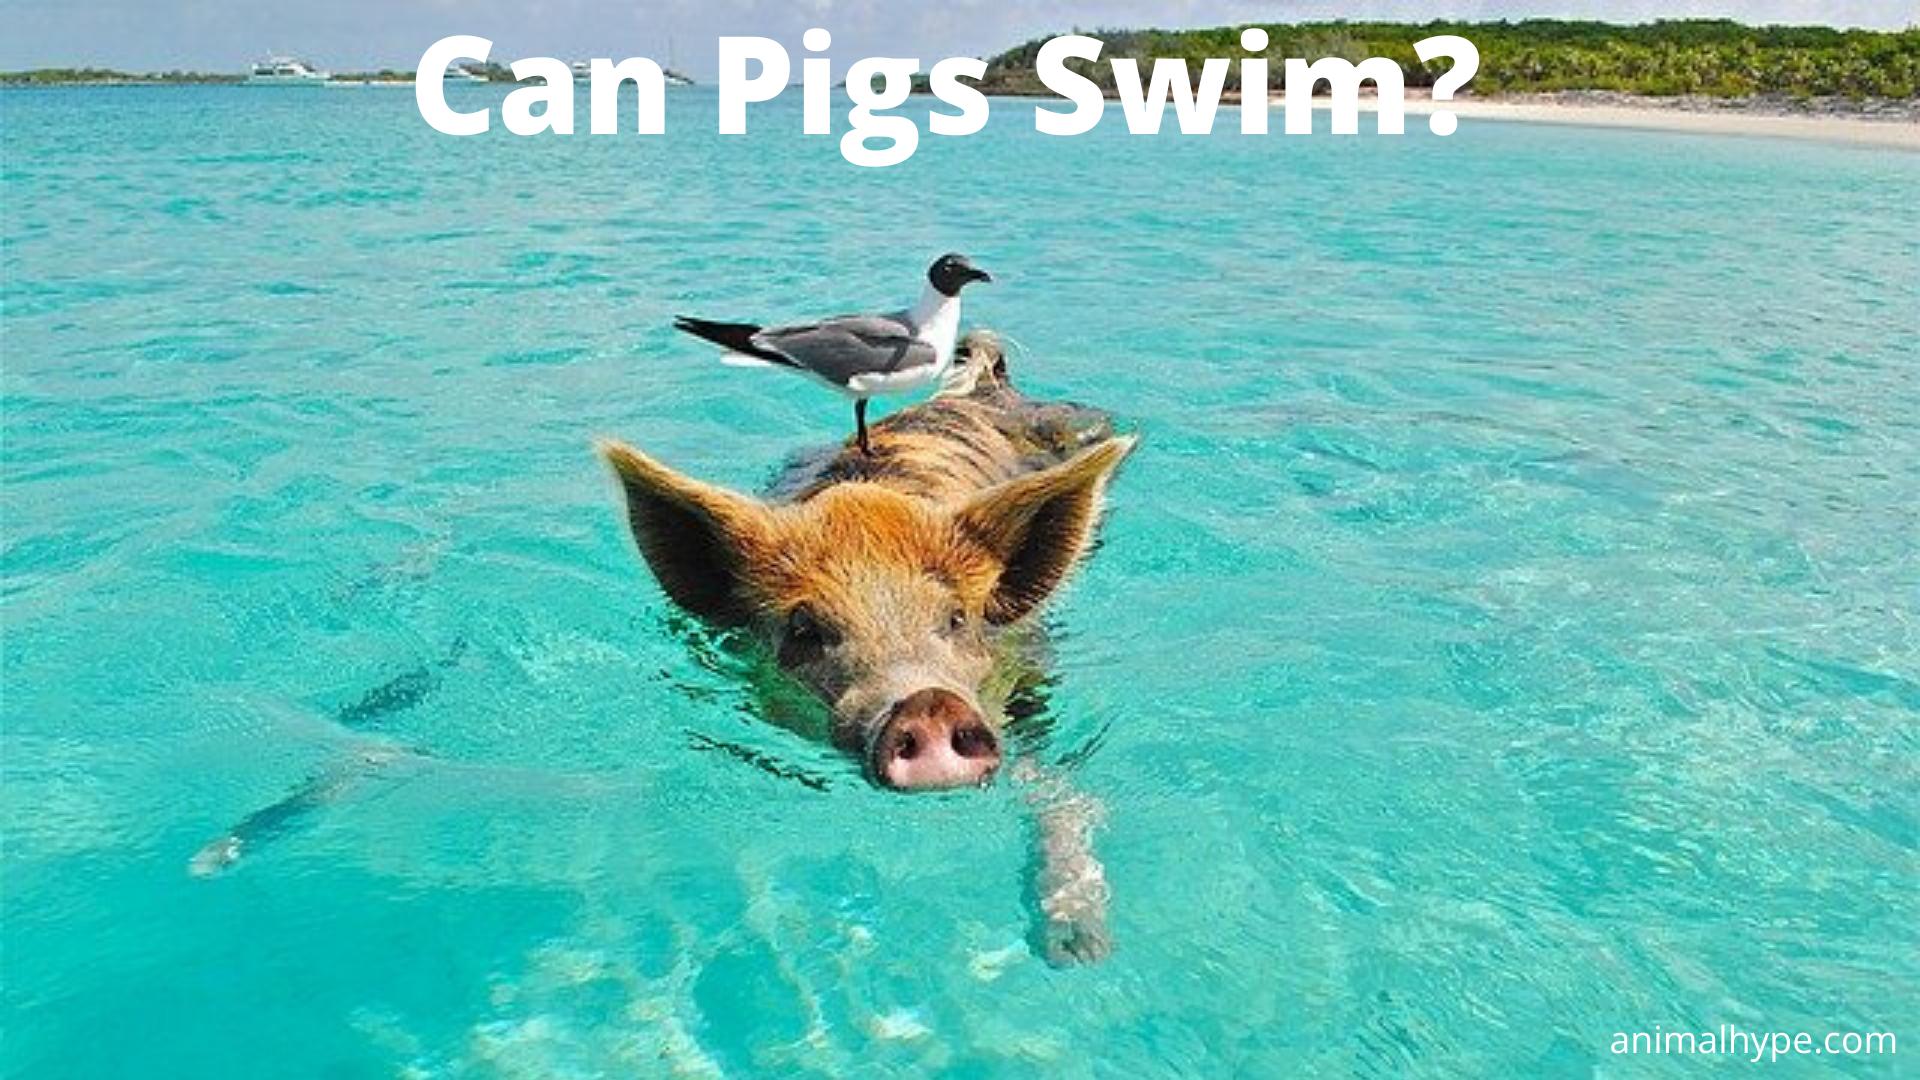 Can Pigs Swim